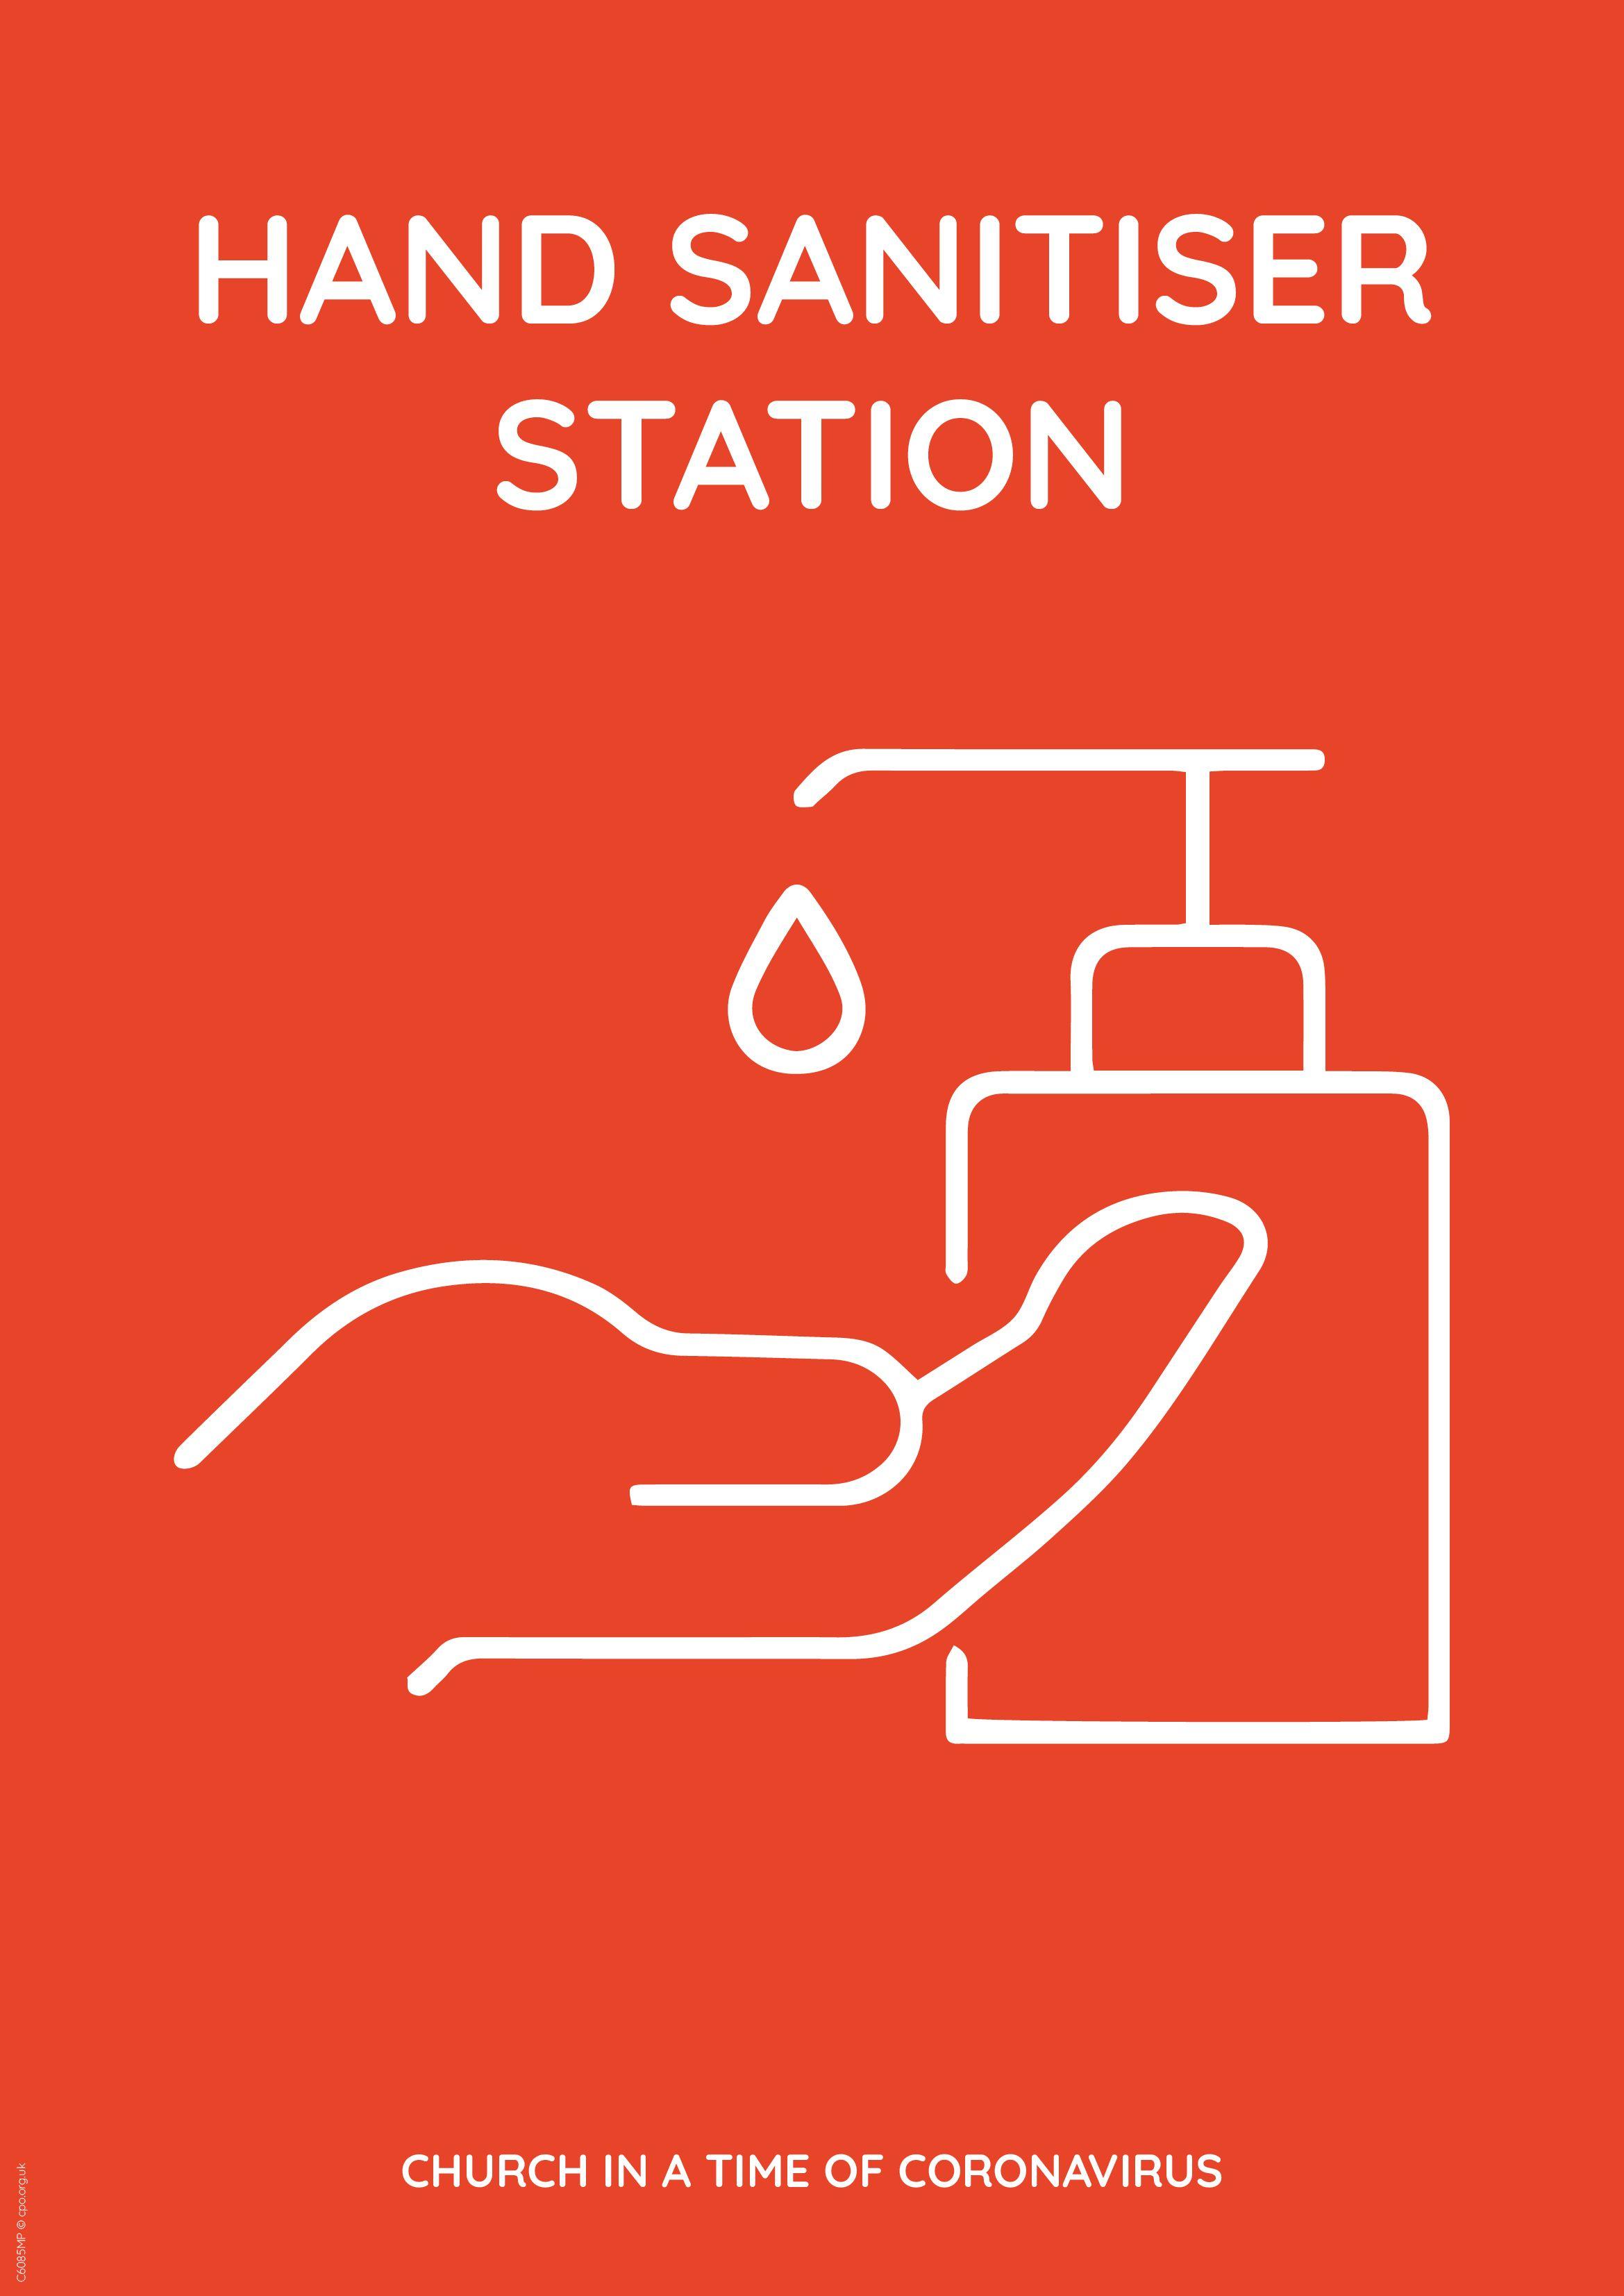 Hand Sanitiser Station in 2020 Hand sanitizer, Classroom